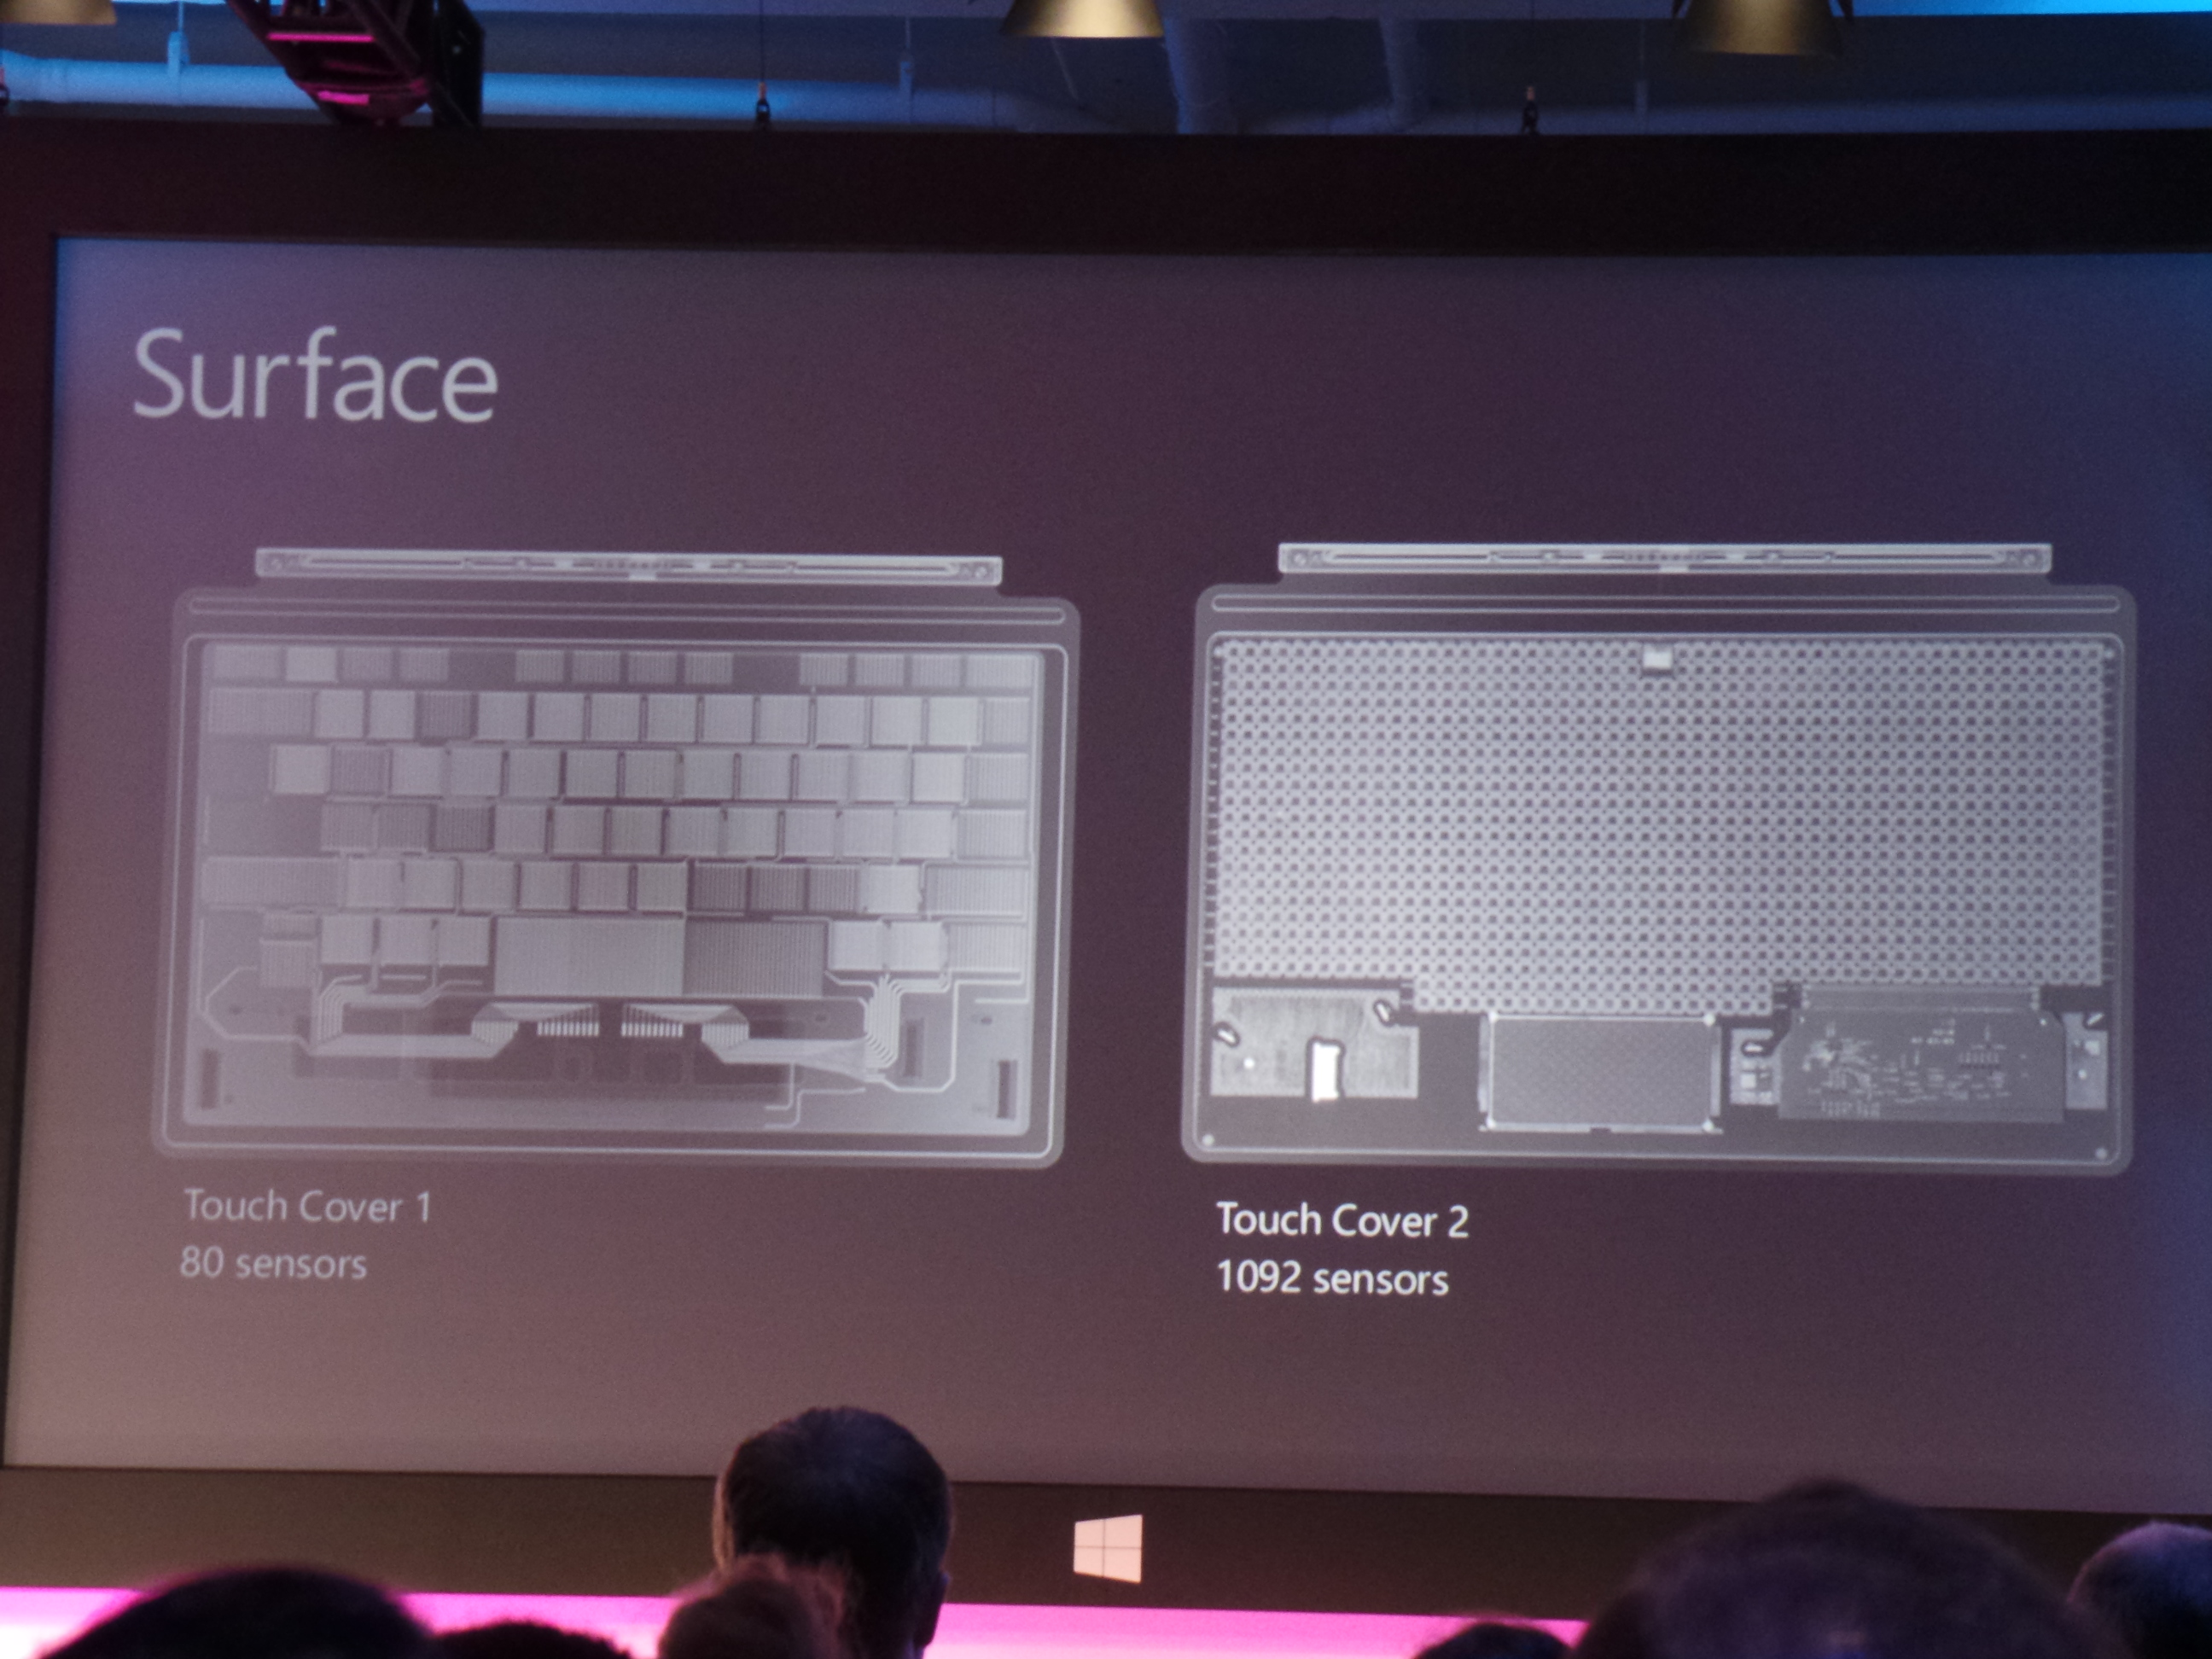 Microsoft Surface 2 - Microsoft-Surface-Pro-2- Type Cover Sensors